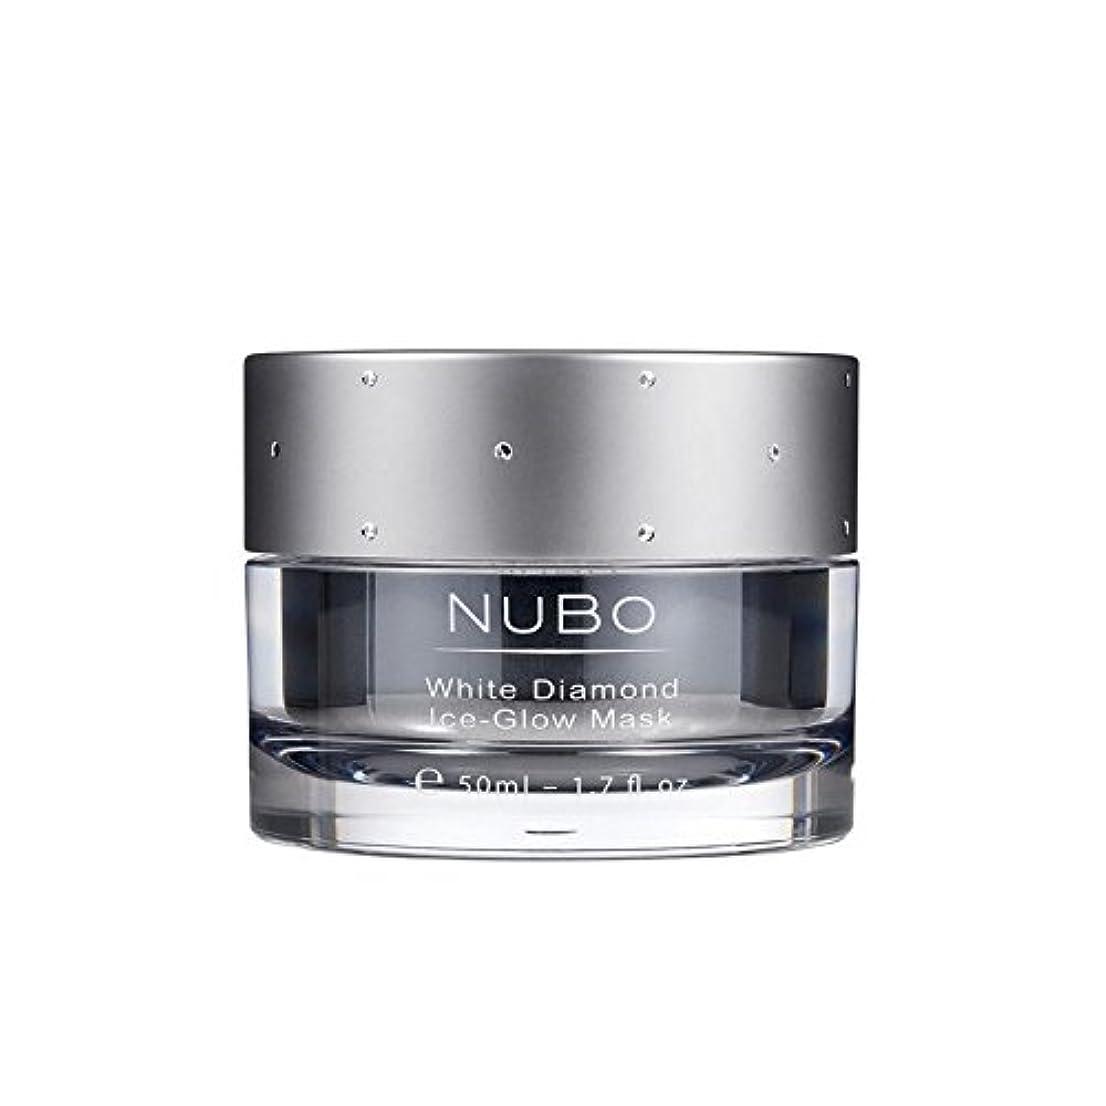 Nubo White Diamond Ice Glow Mask 50ml - 白いダイヤモンドの氷のグローマスク50ミリリットル [並行輸入品]